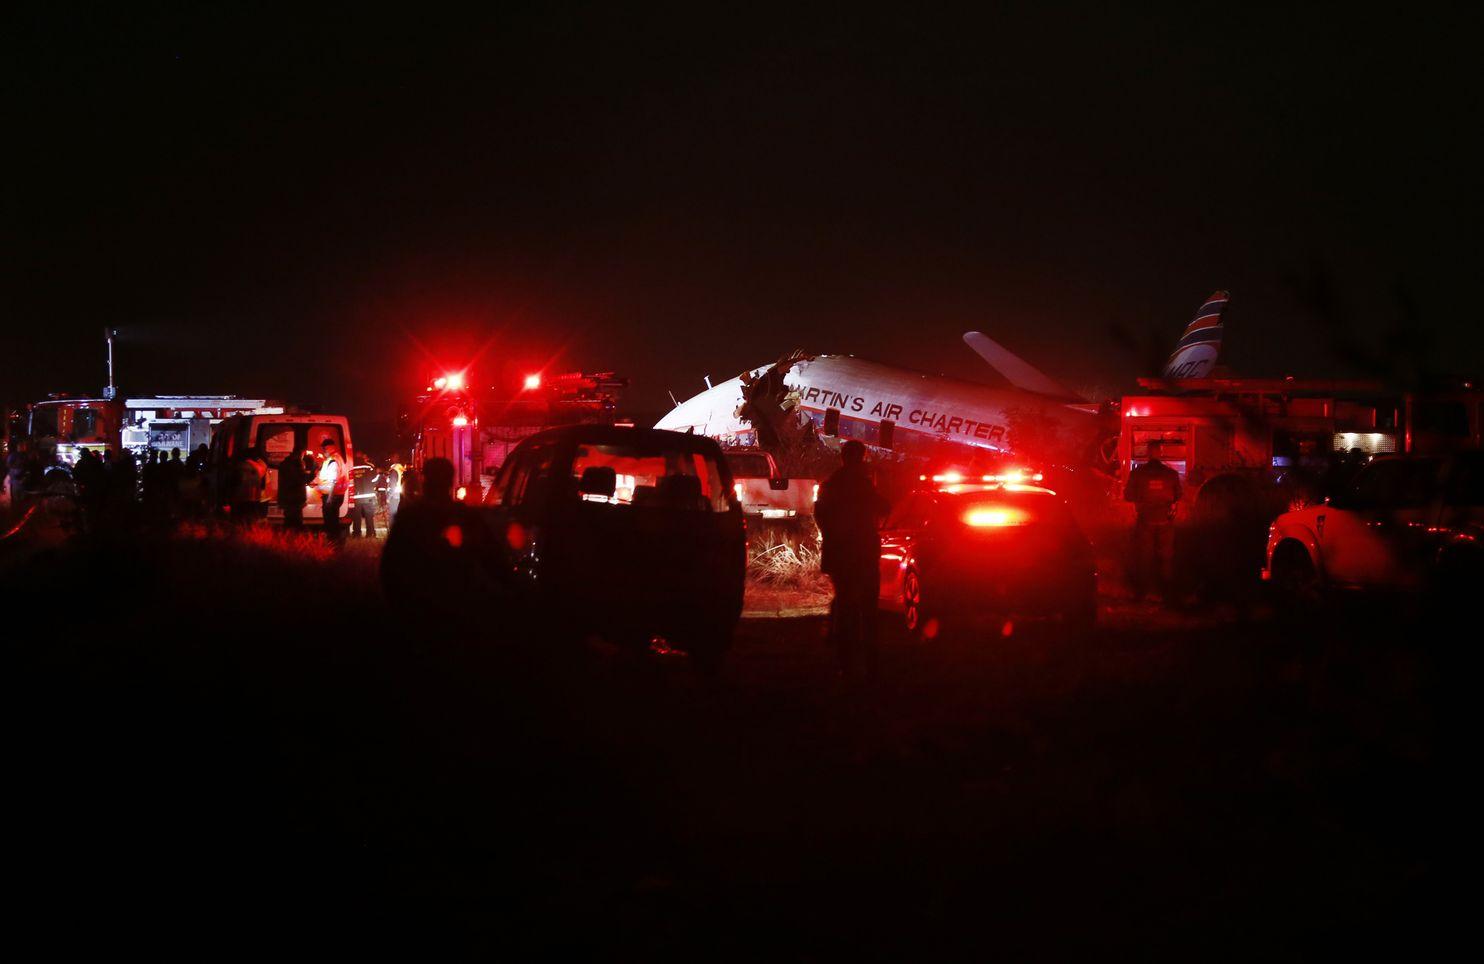 South Africa plane crash kills 1, injures 20